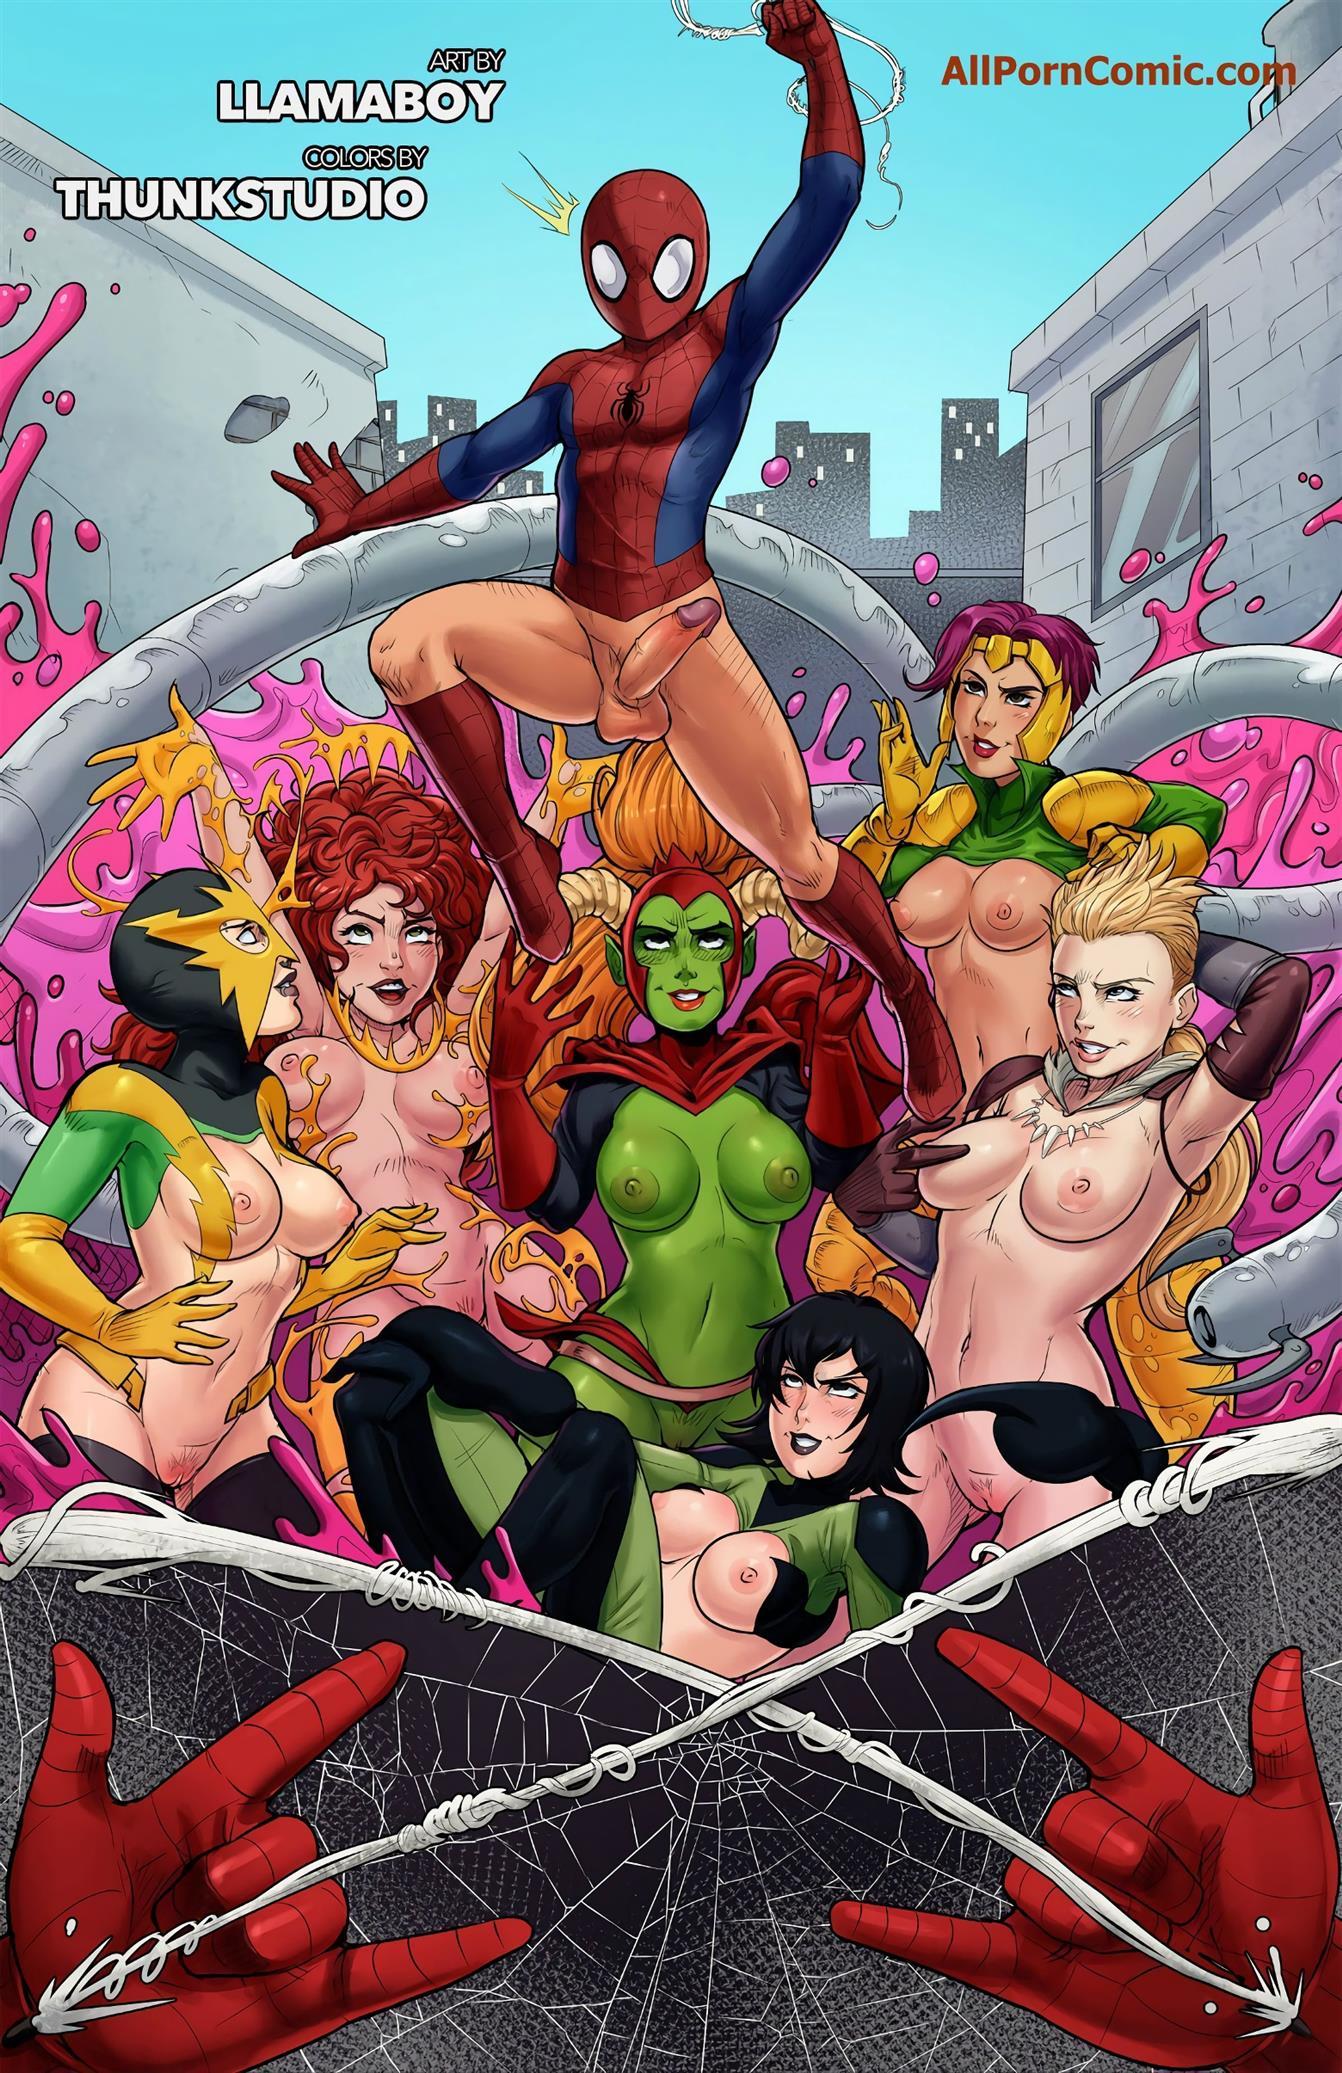 Sinful Six (Spider-Man) [Tracy Scops] - Foto 11